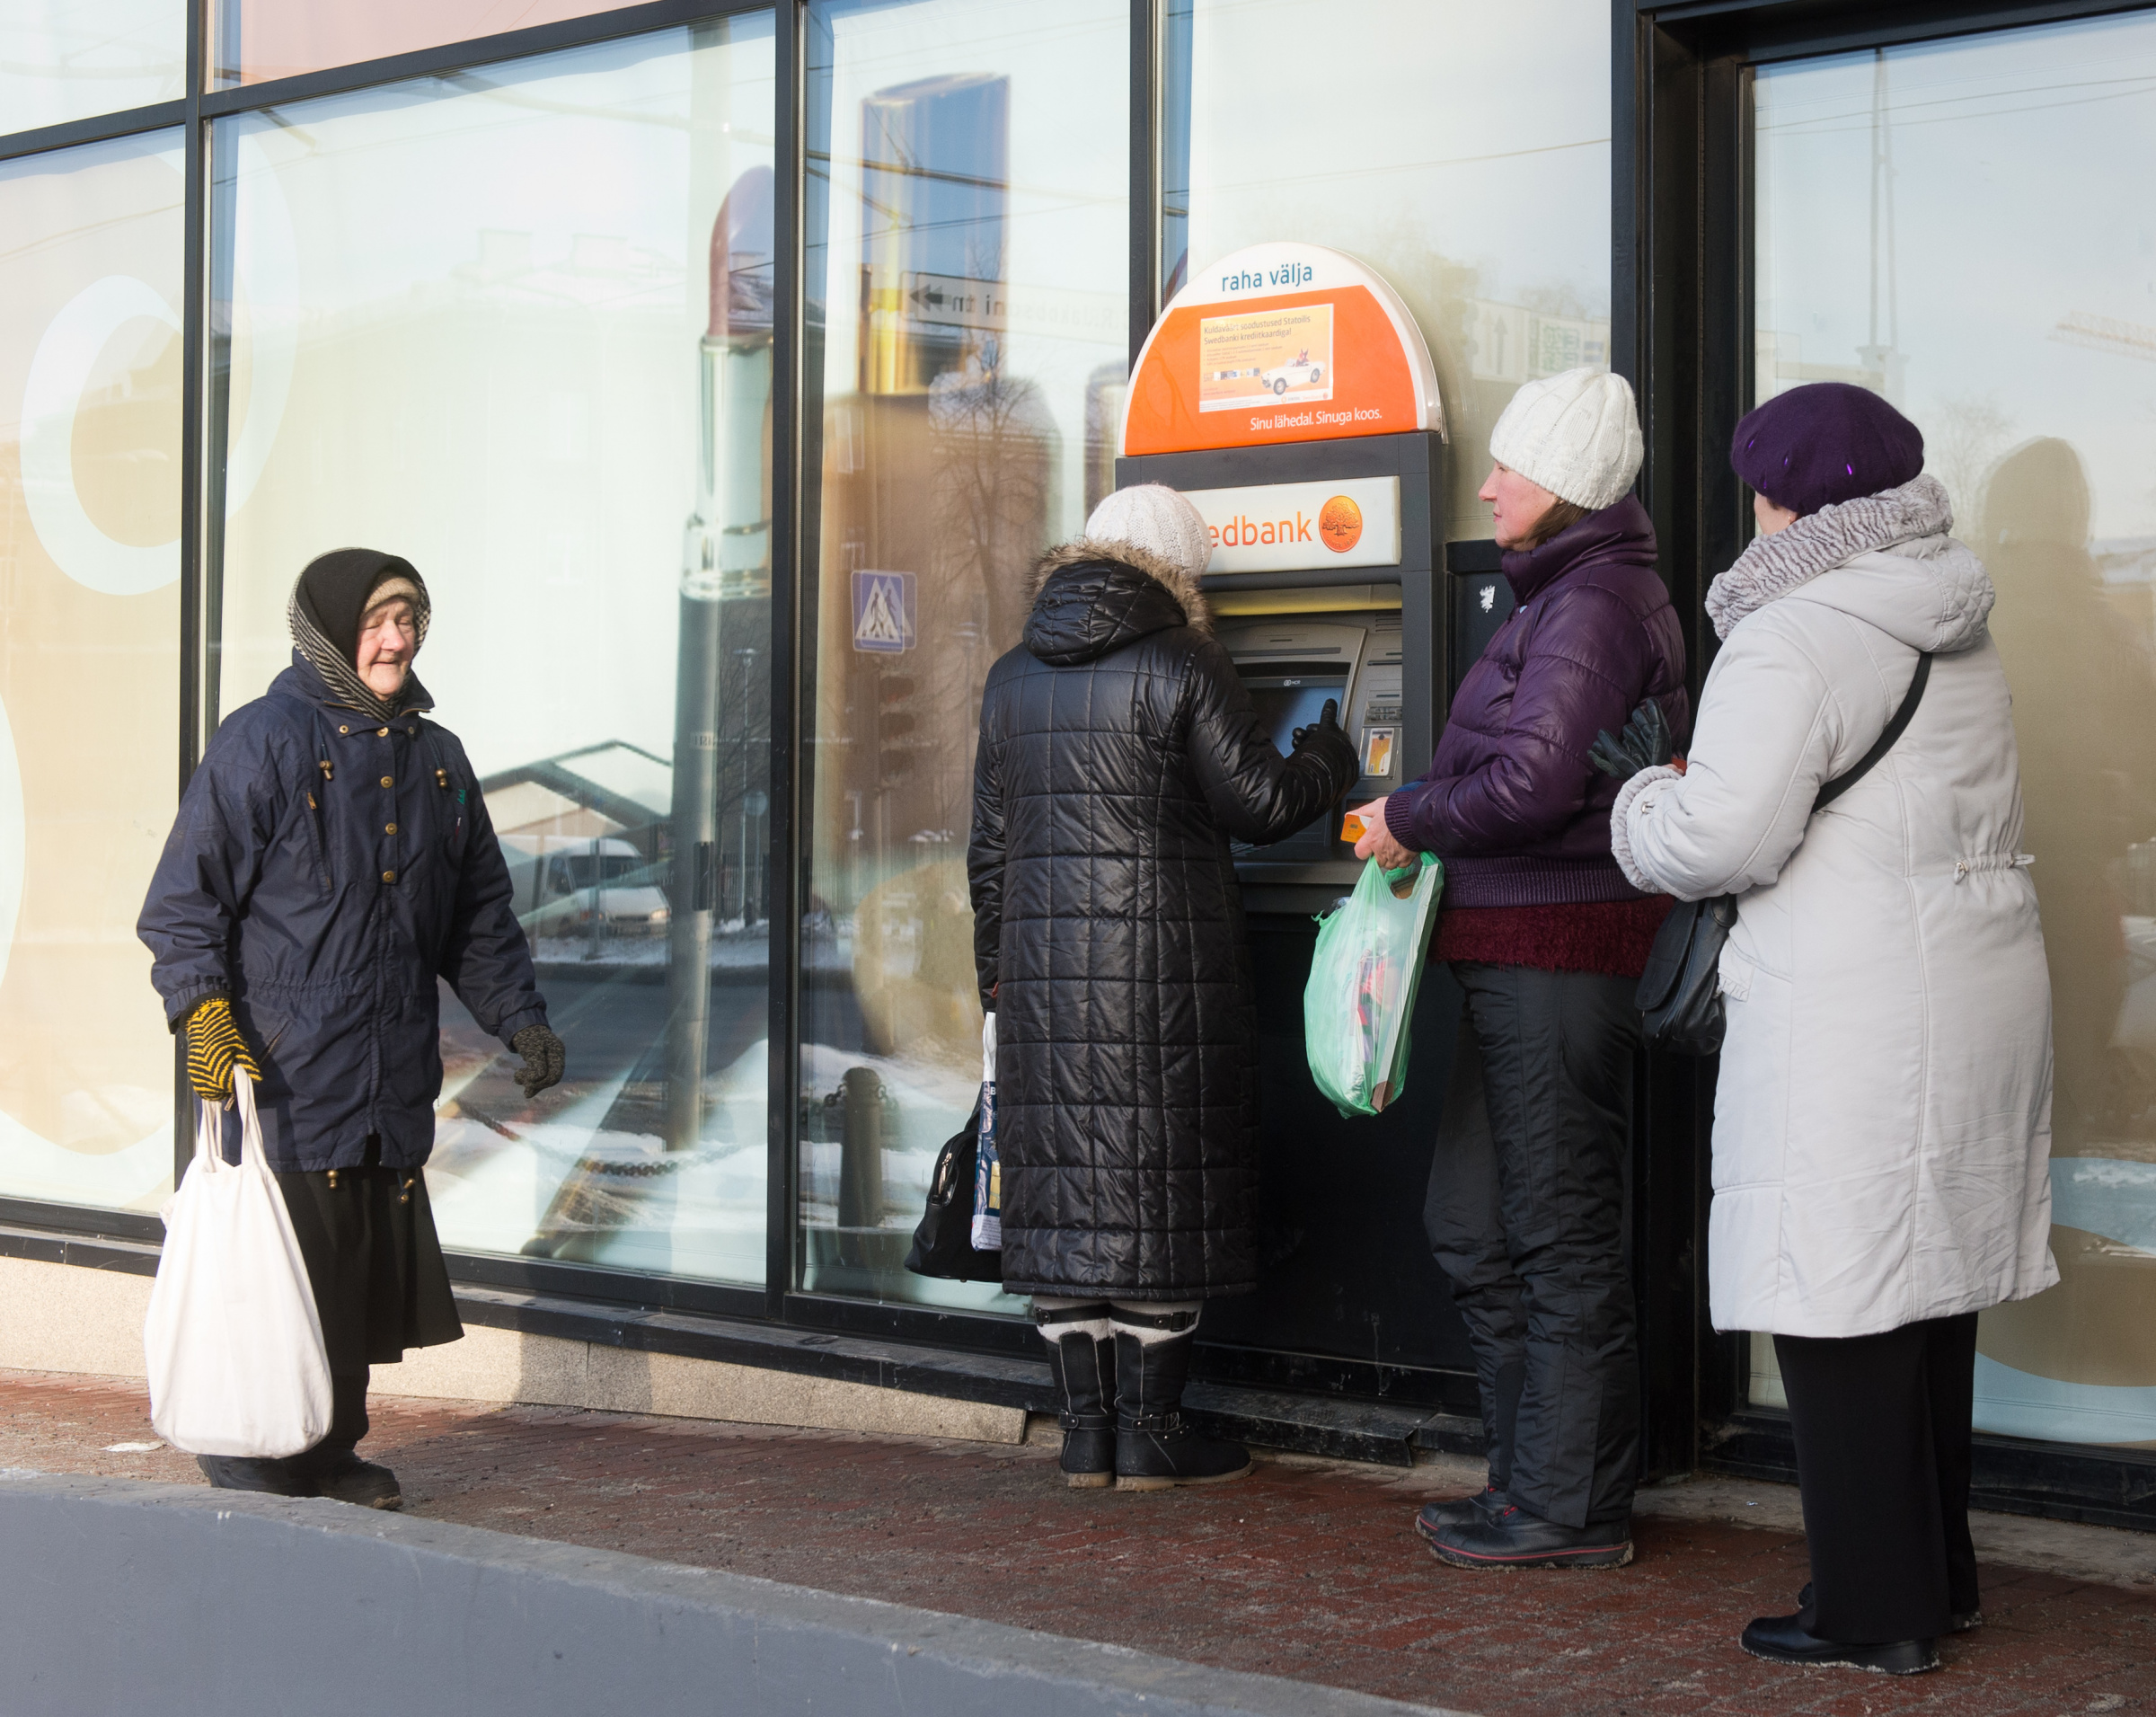 Majandus.ee: Sularaha pension pensionikonto Foto: MIHKEL MARIPUU/POSTIMEES